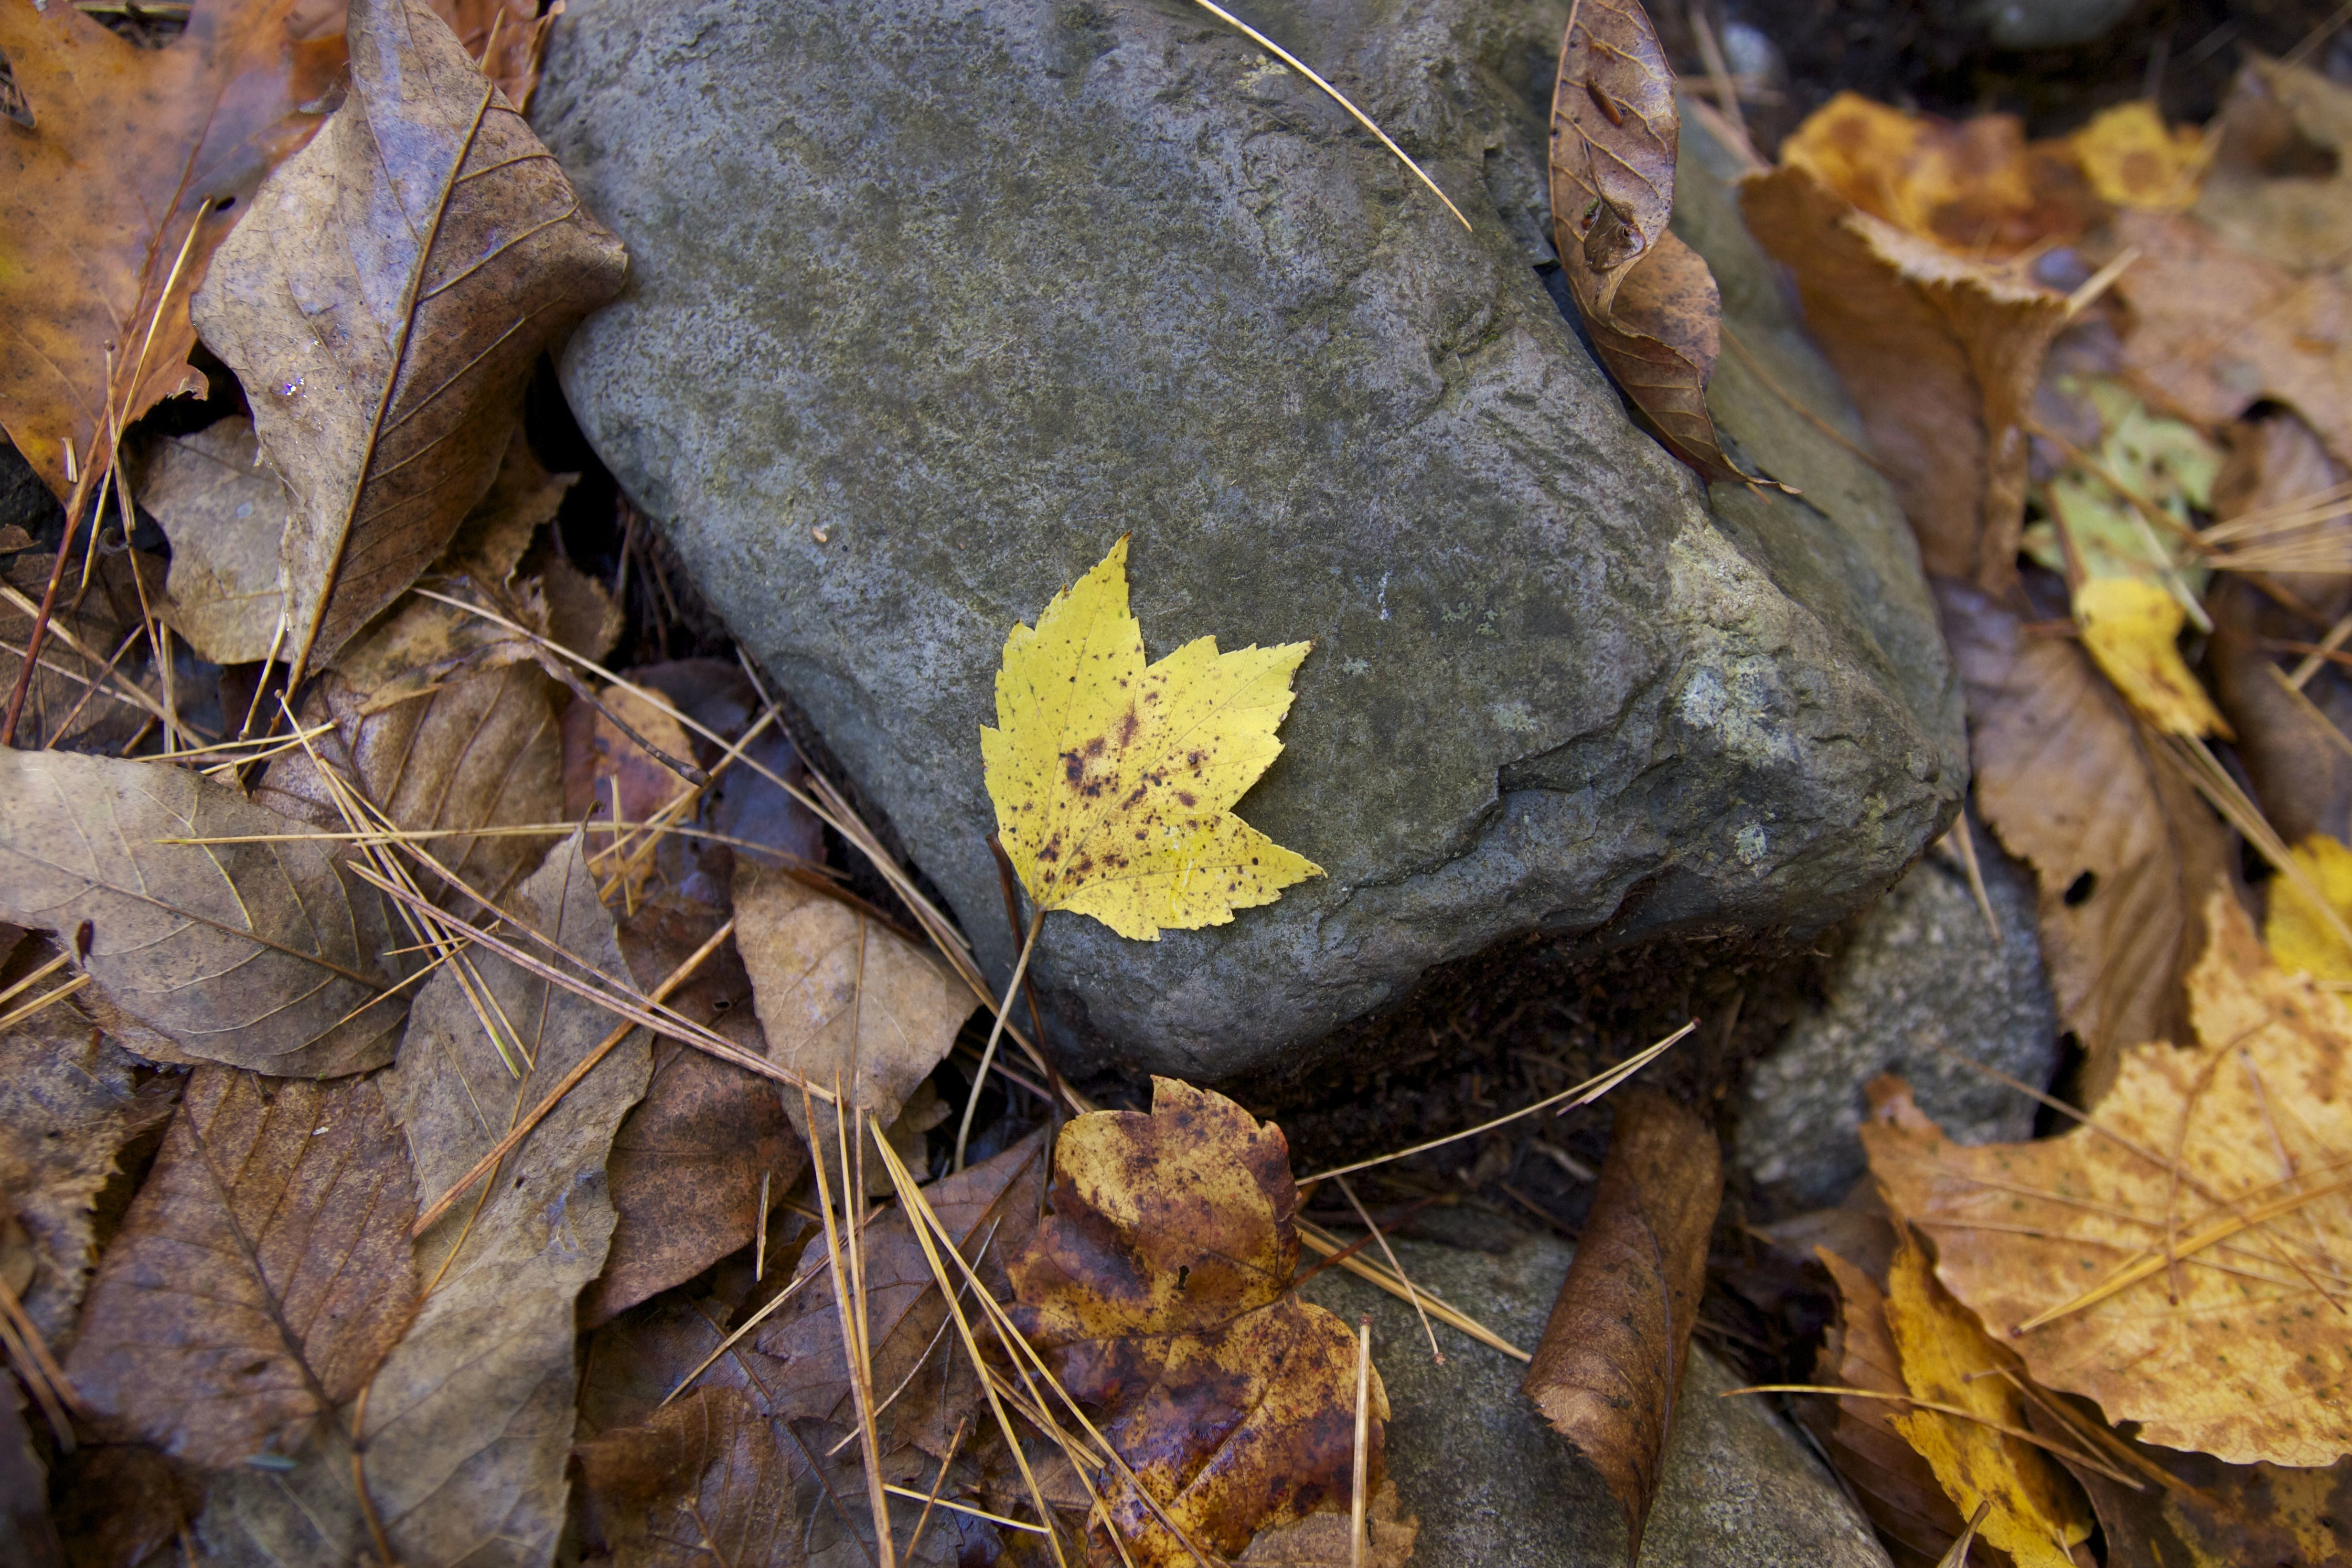 gray rock, leaves, october, autumn season, foliage, leaves, rocks